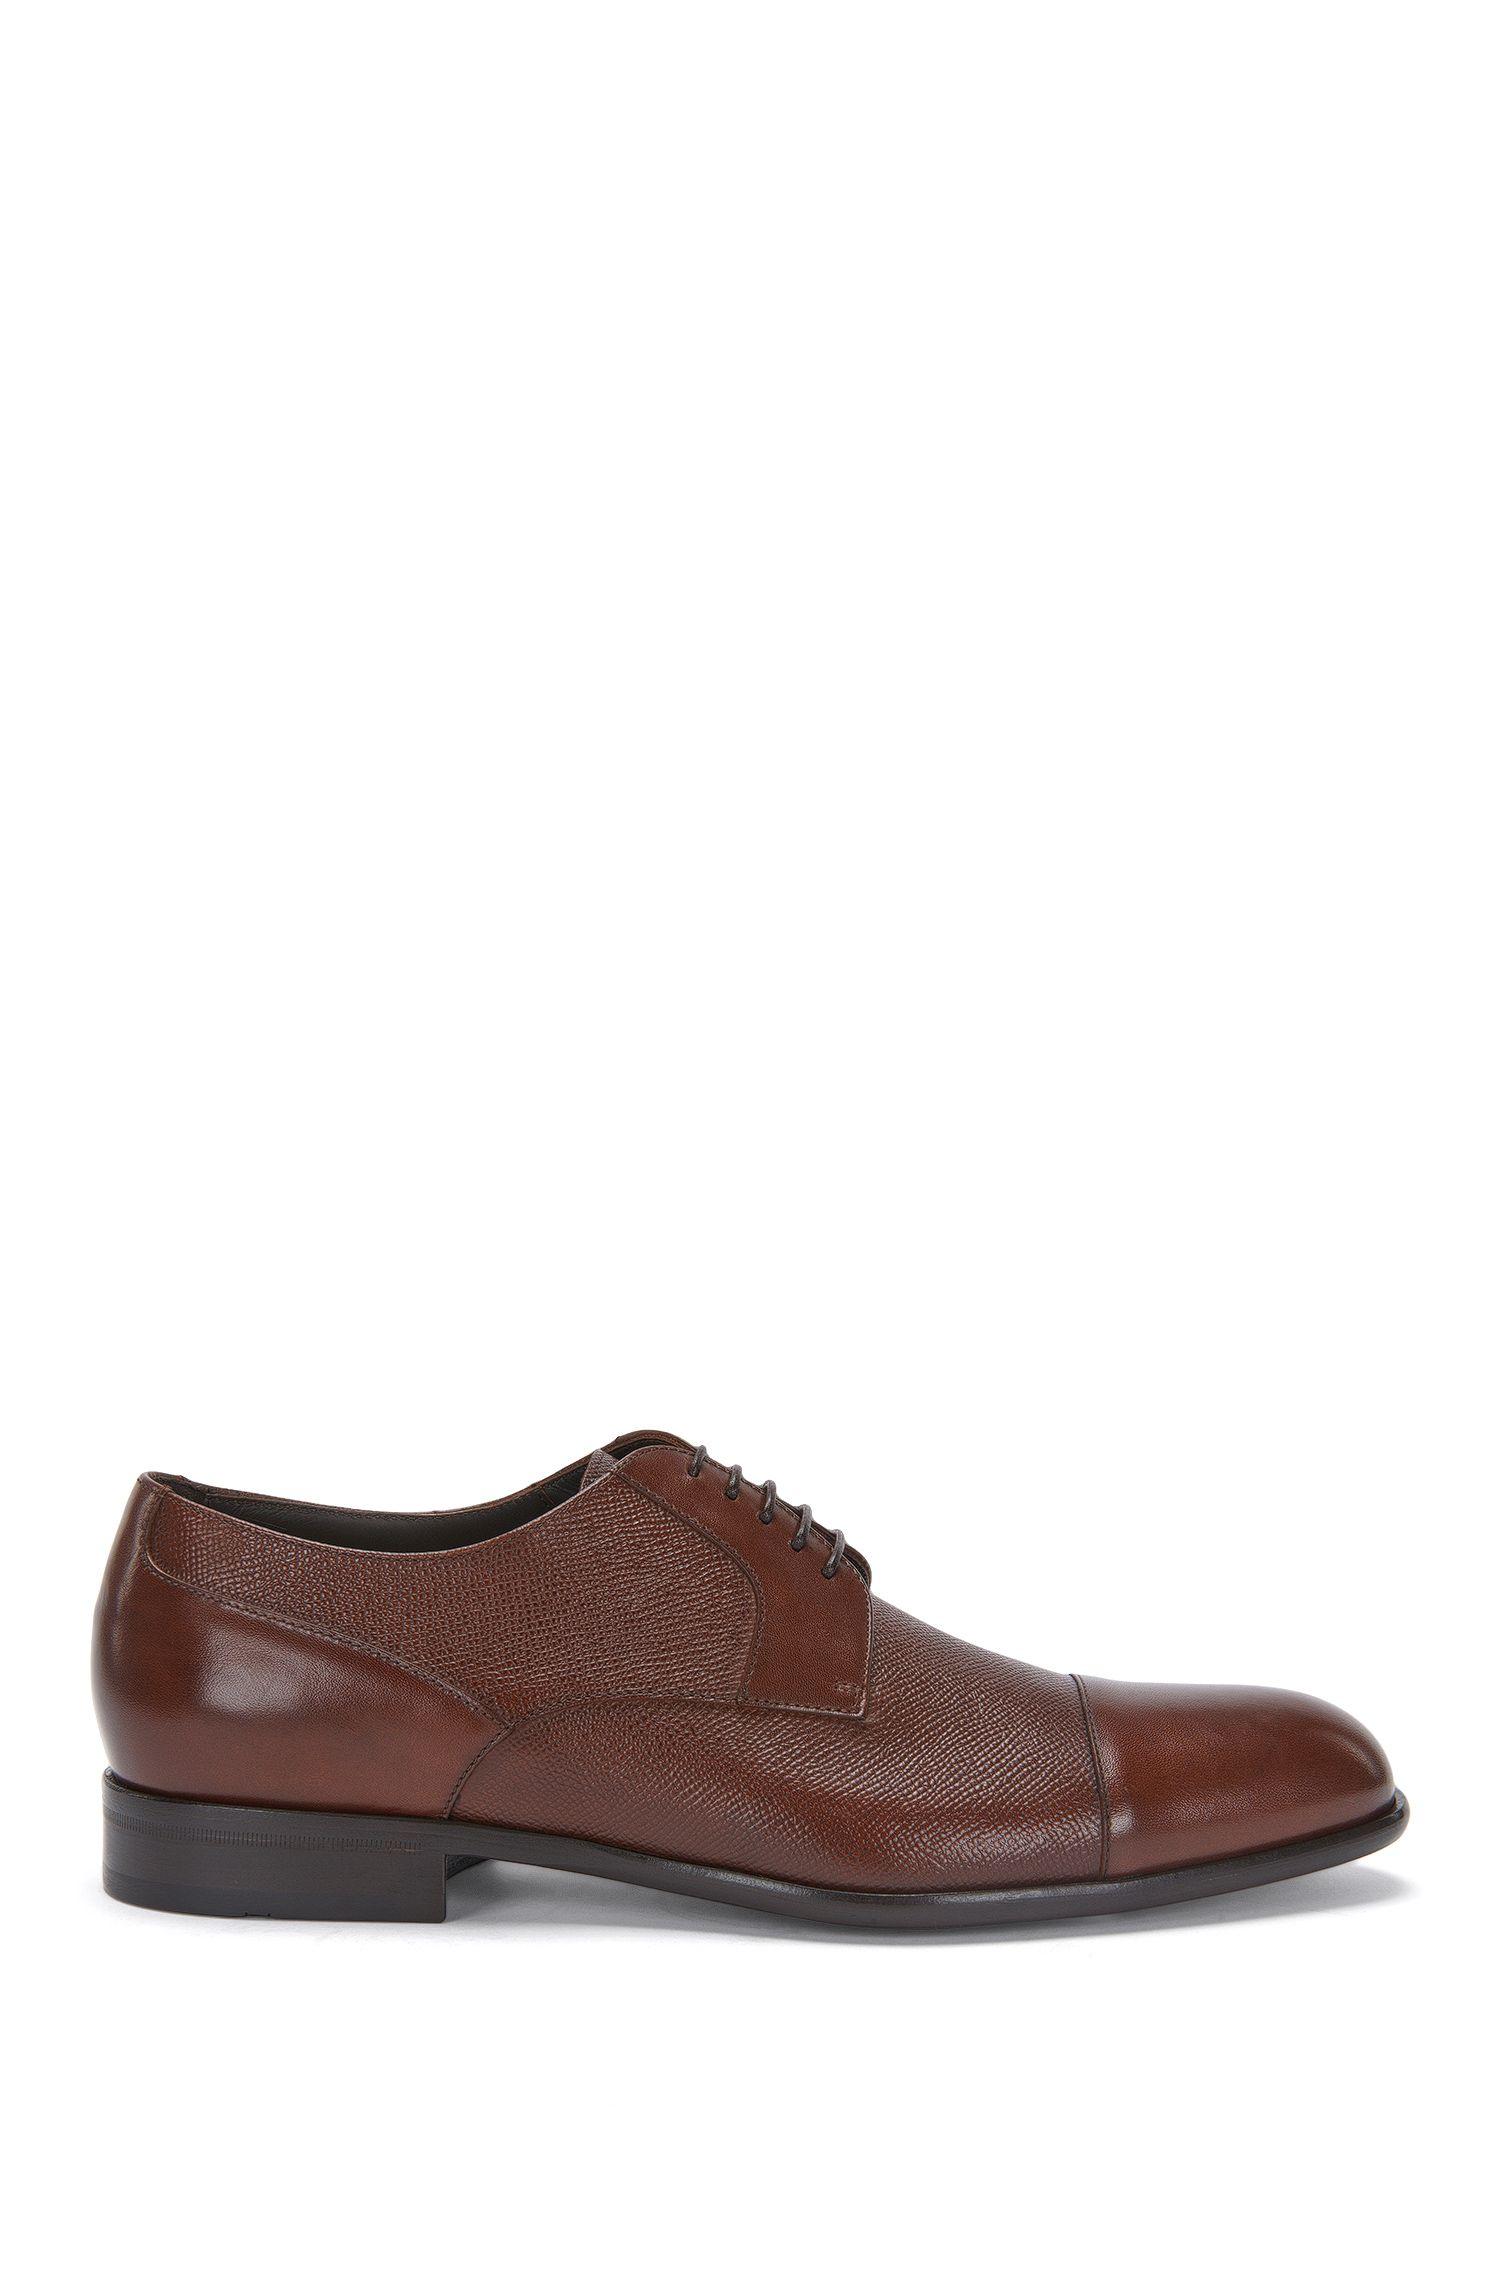 Italian Leather Derby Dress Shoe | Manhattan Derb Prct